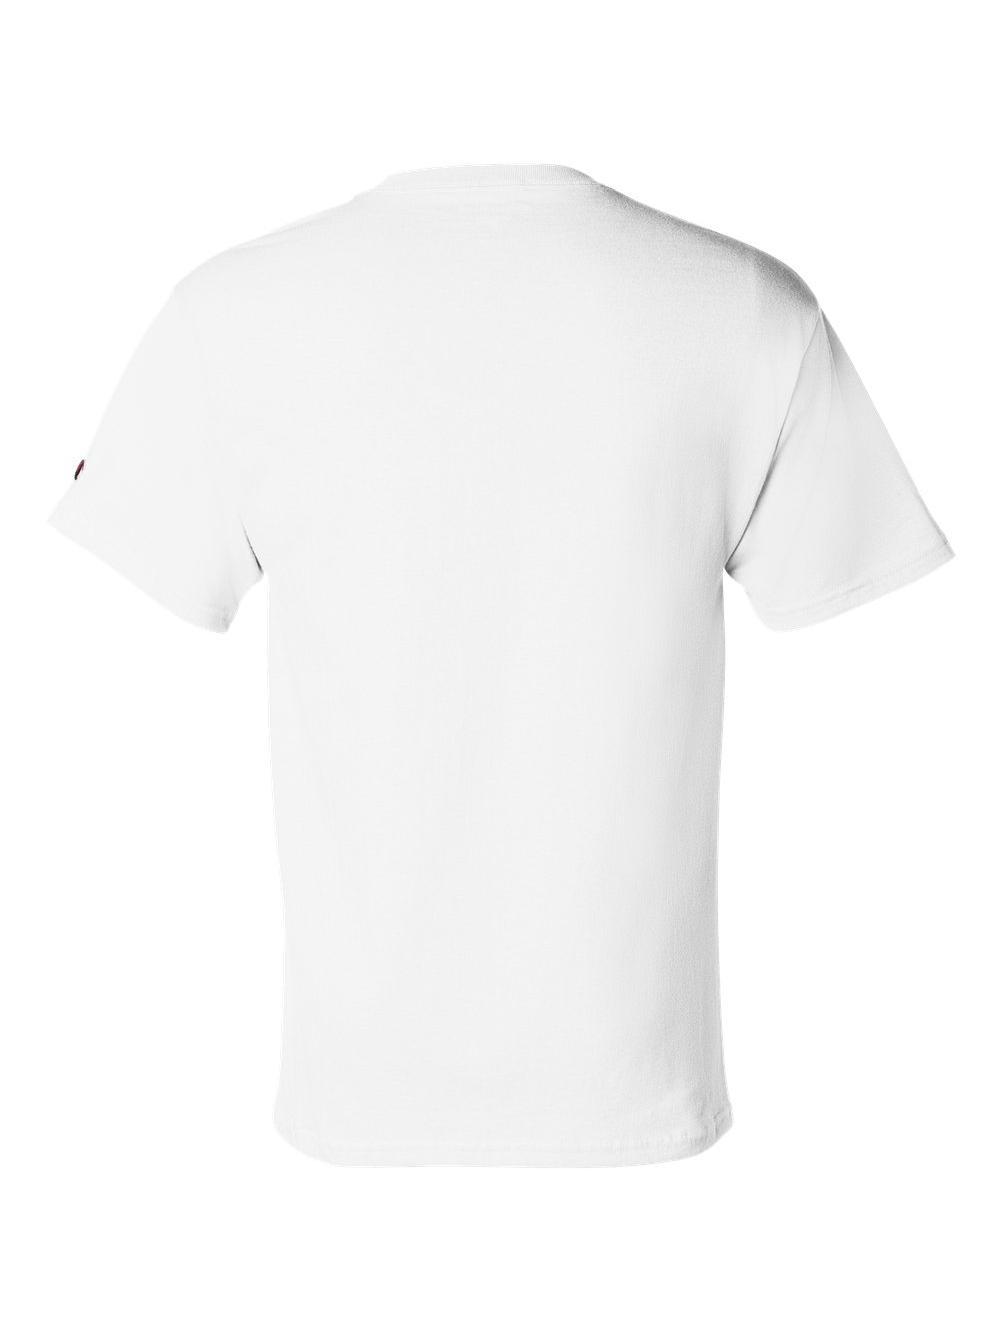 Champion-Short-Sleeve-T-Shirt-T425 thumbnail 31